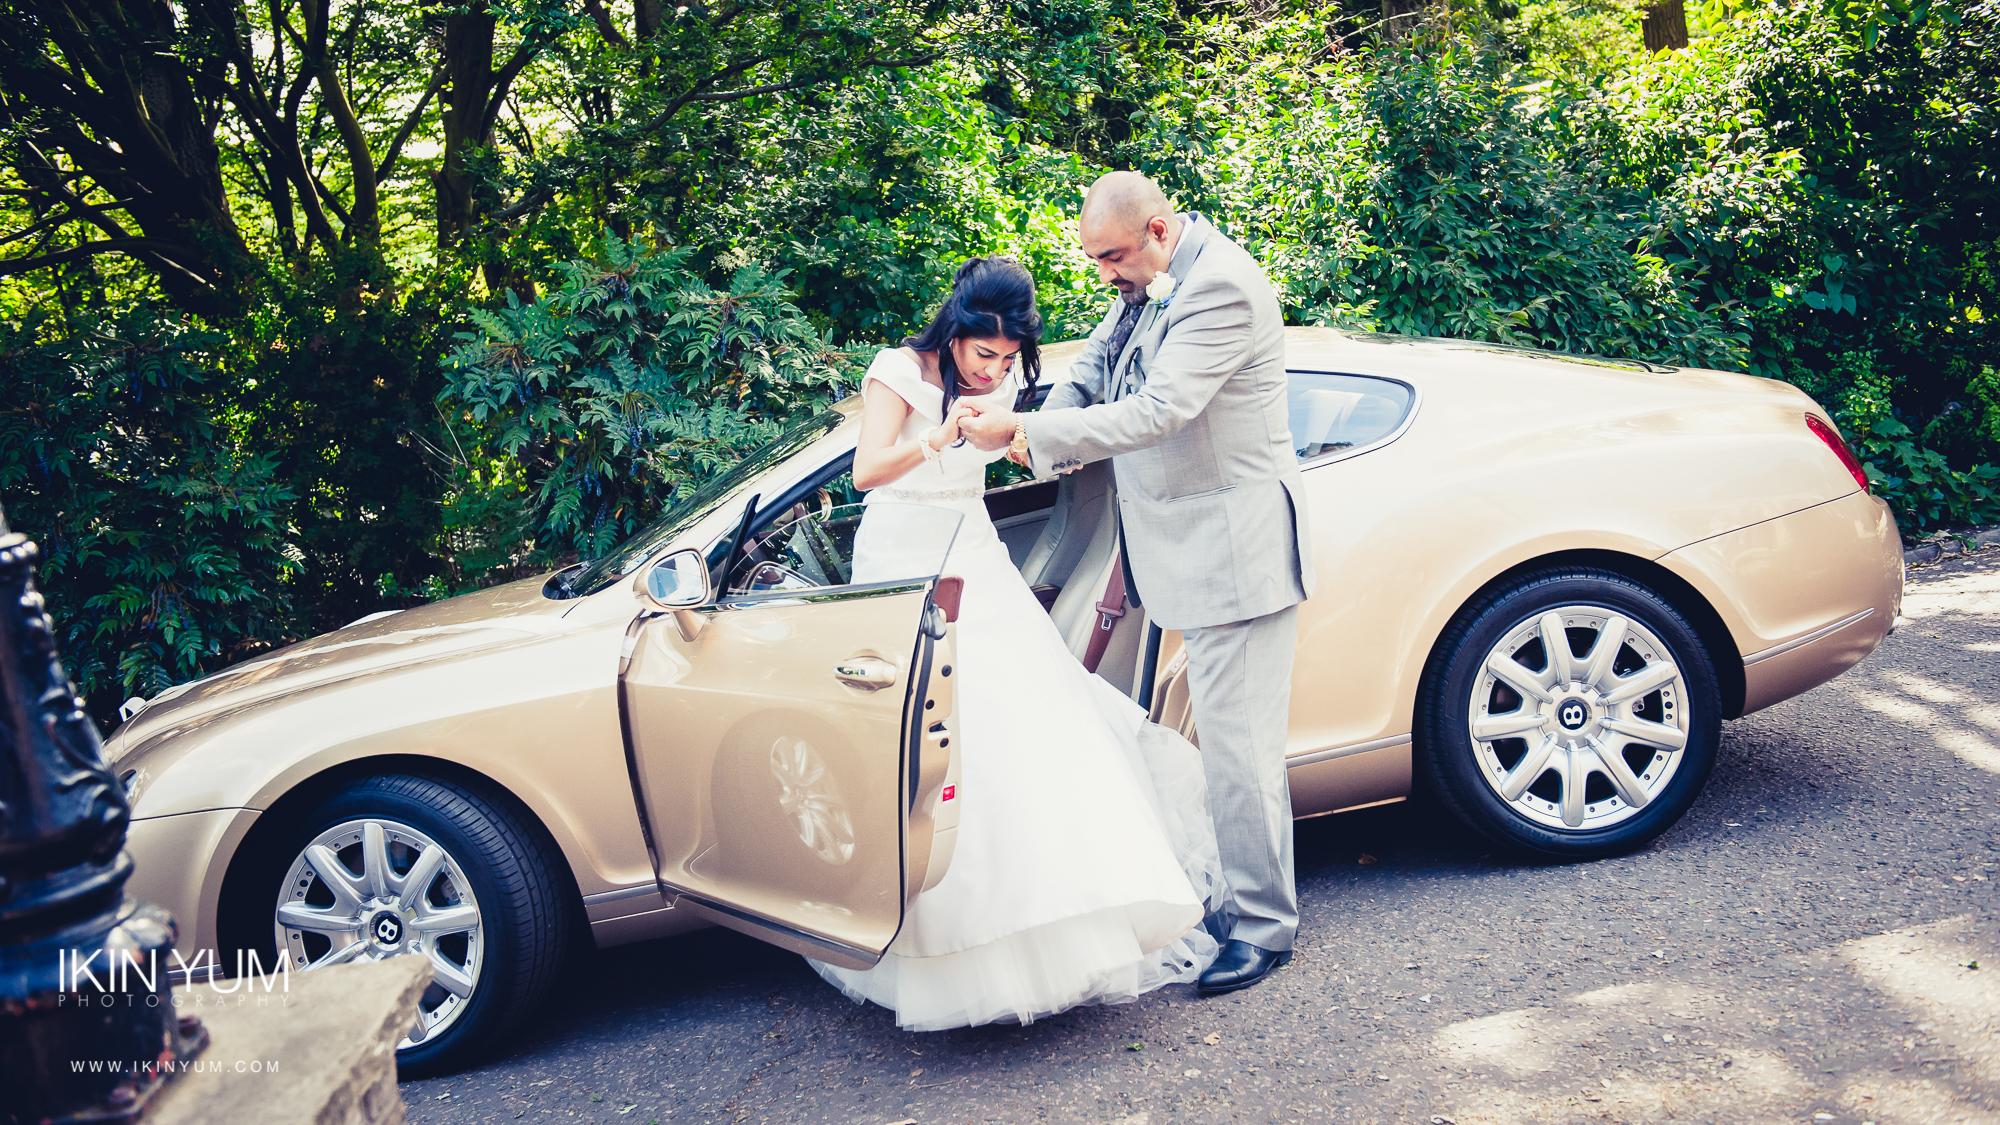 Holland Park Wedding - Ikin Yum Photography-0022.jpg